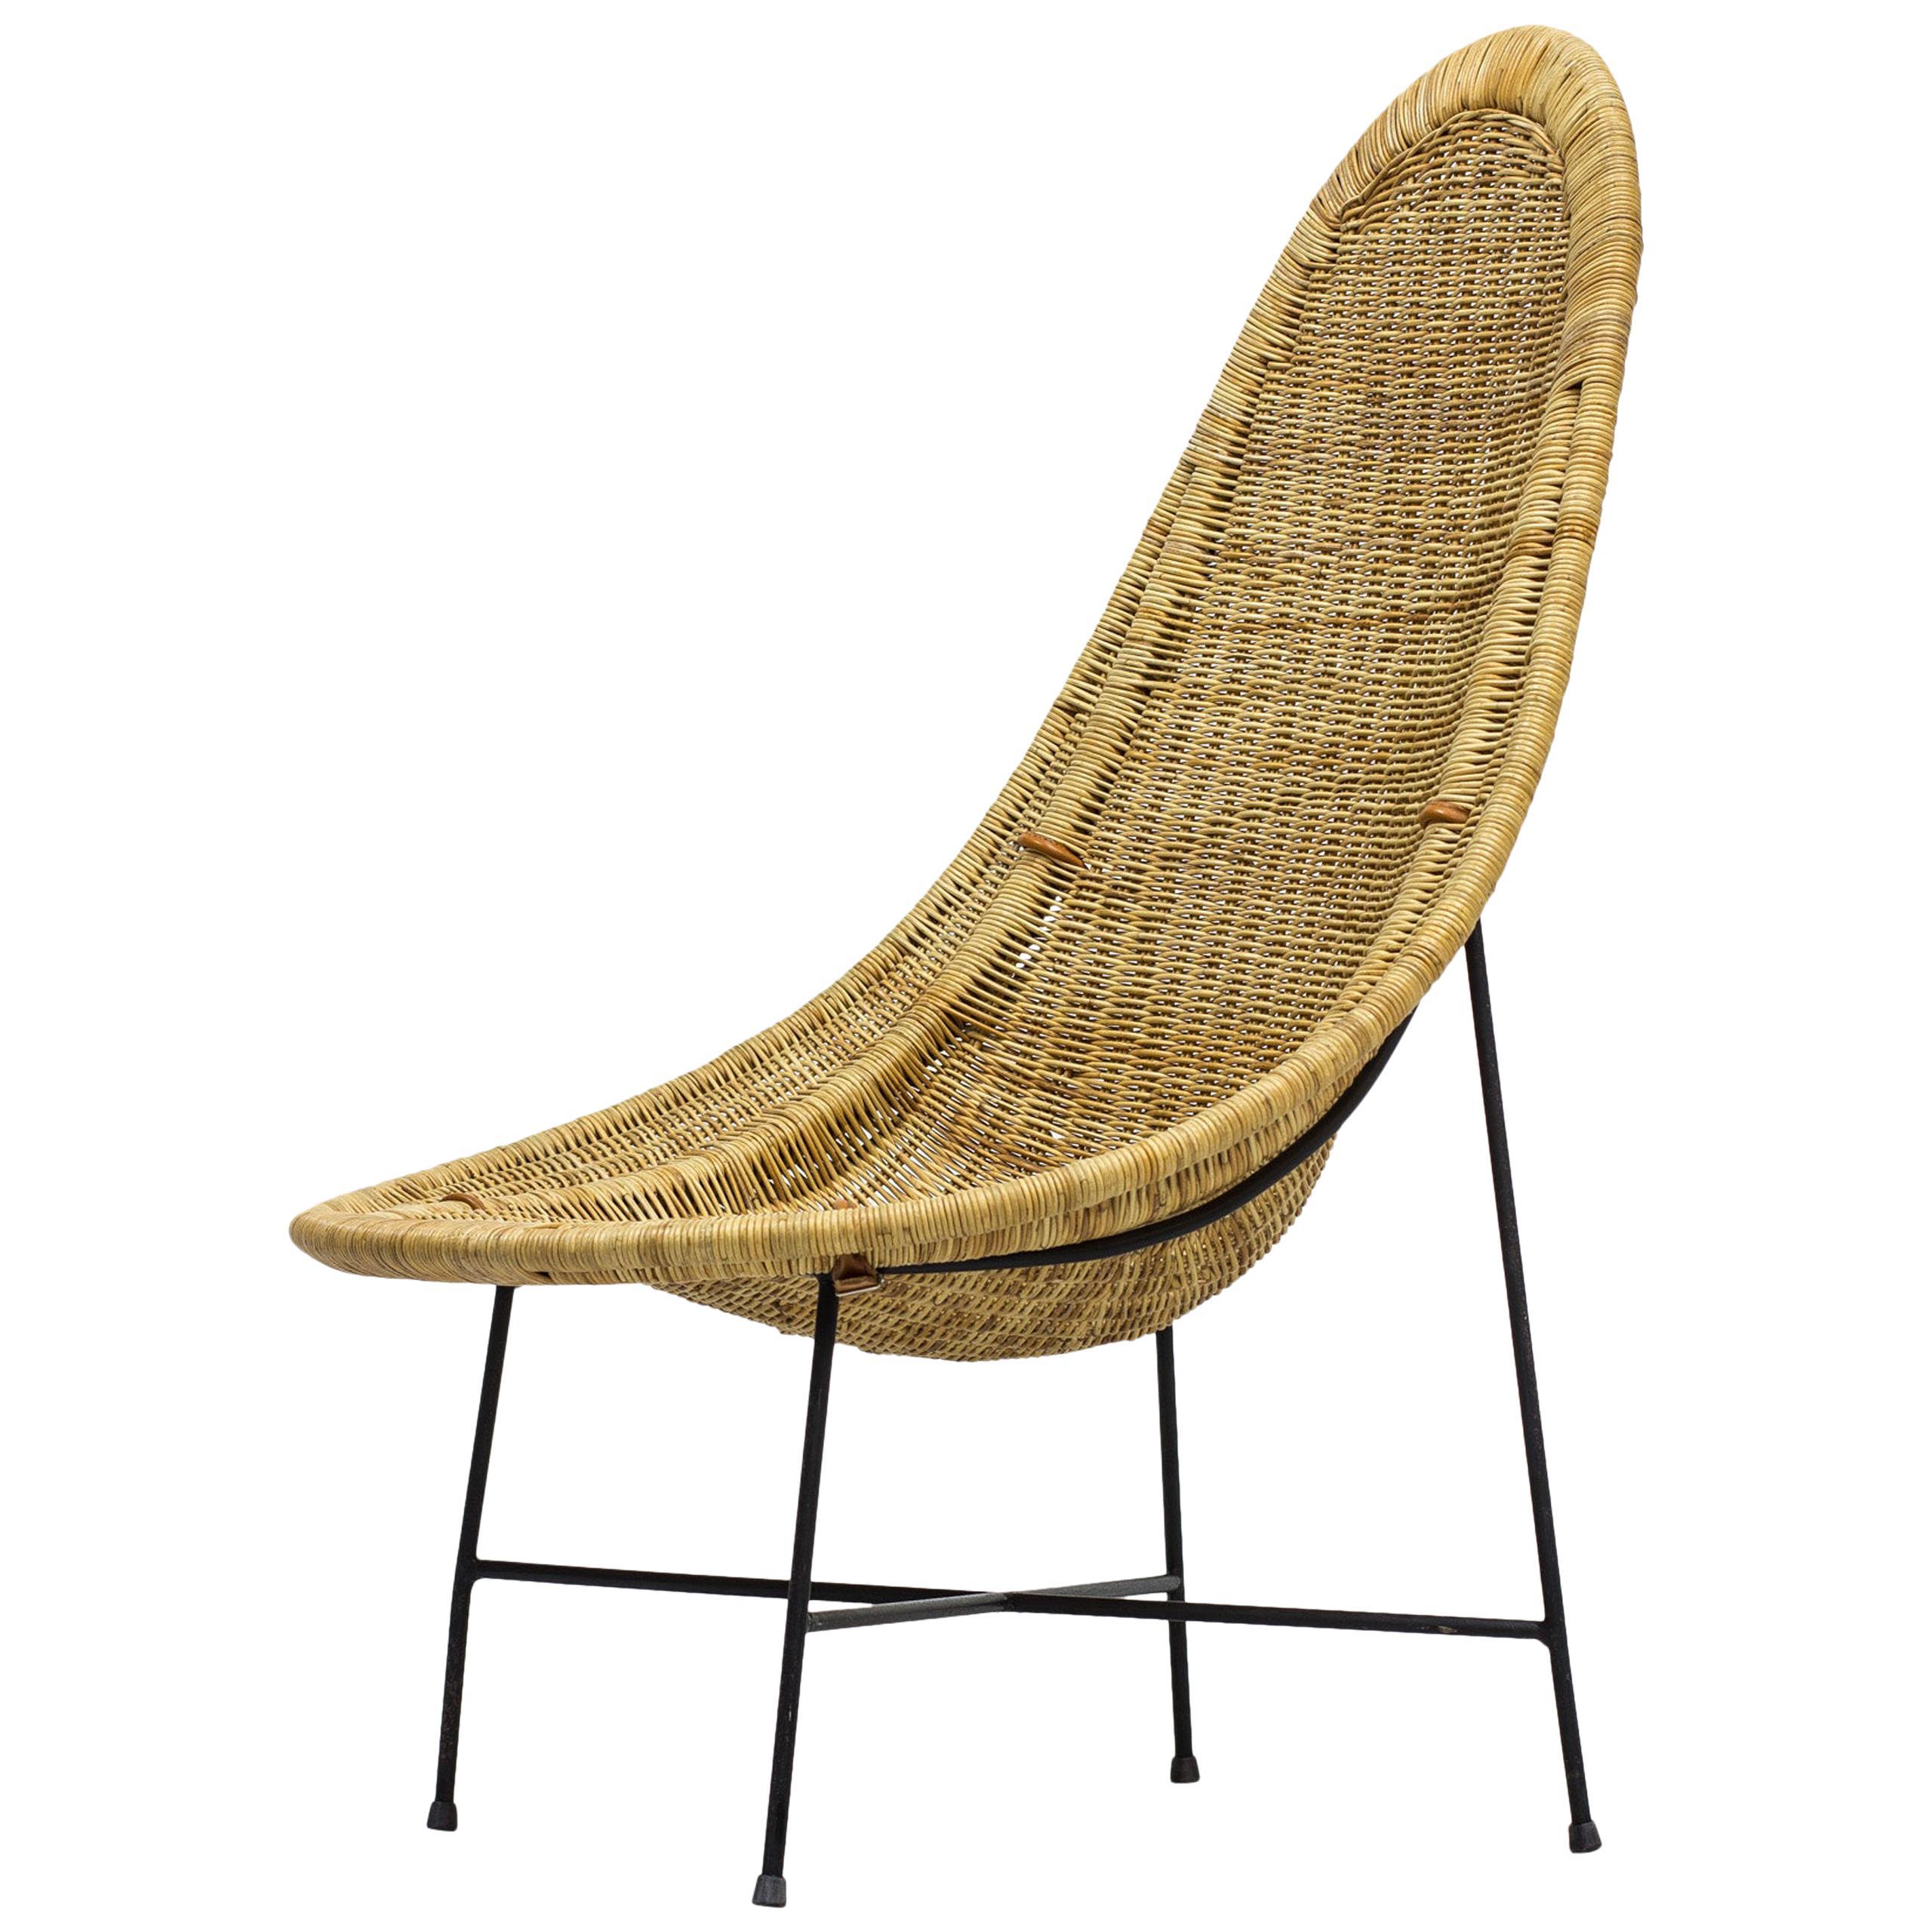 "Lounge Chair ""Kraal"" by Kerstin Hörlin-Holmquist for Nordiska Kompaniet"